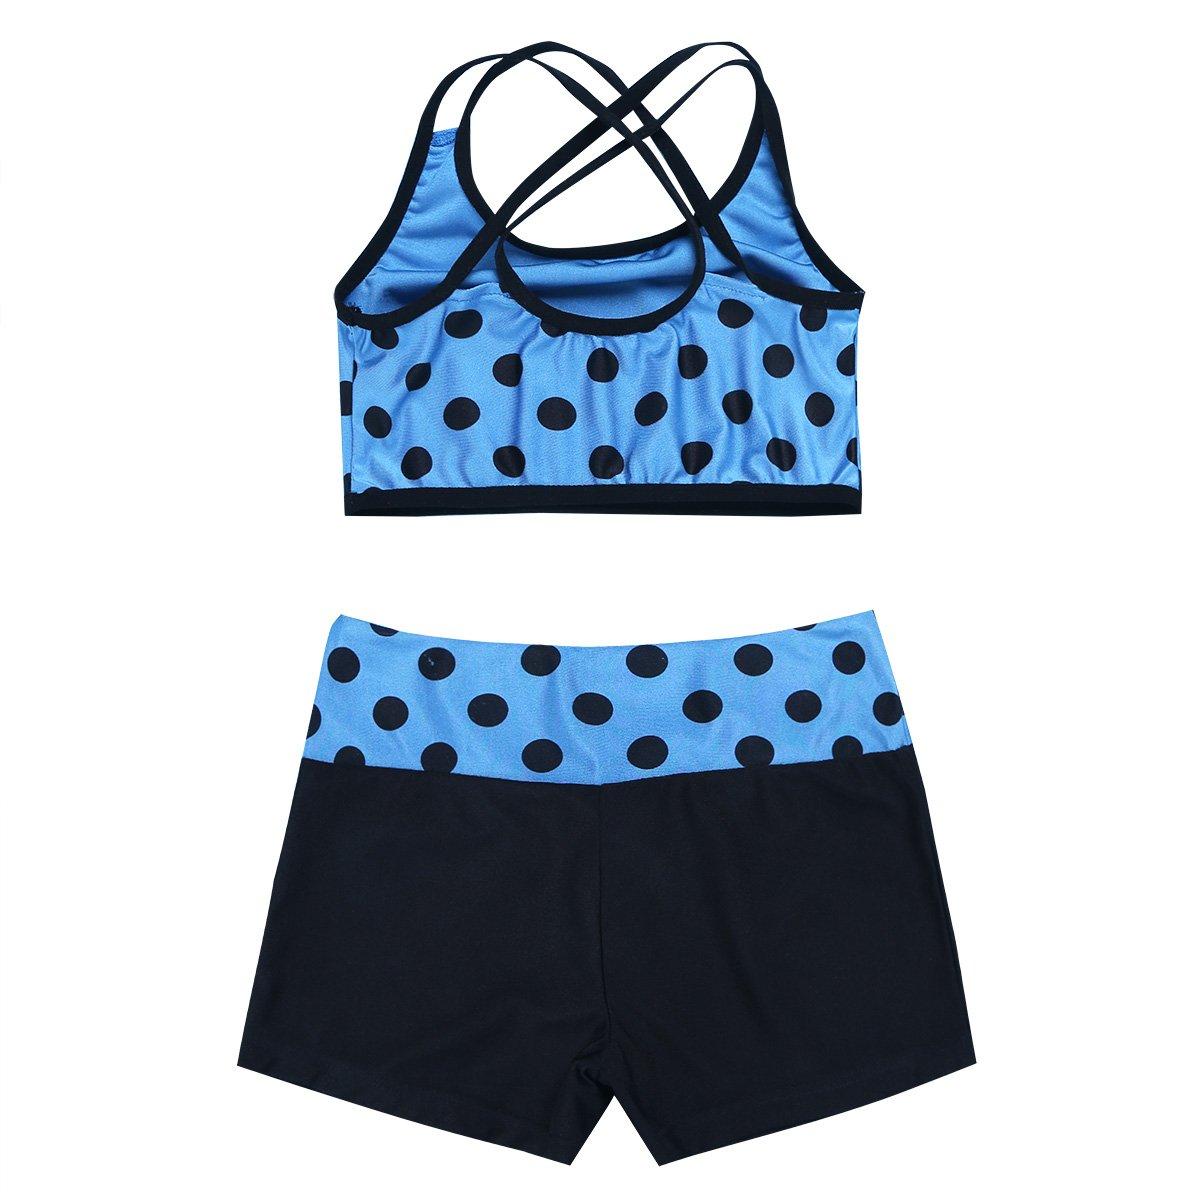 MSemis SOCKSHOSIERY ガールズ B07H5F7QXX Blue Polka Dots 43813